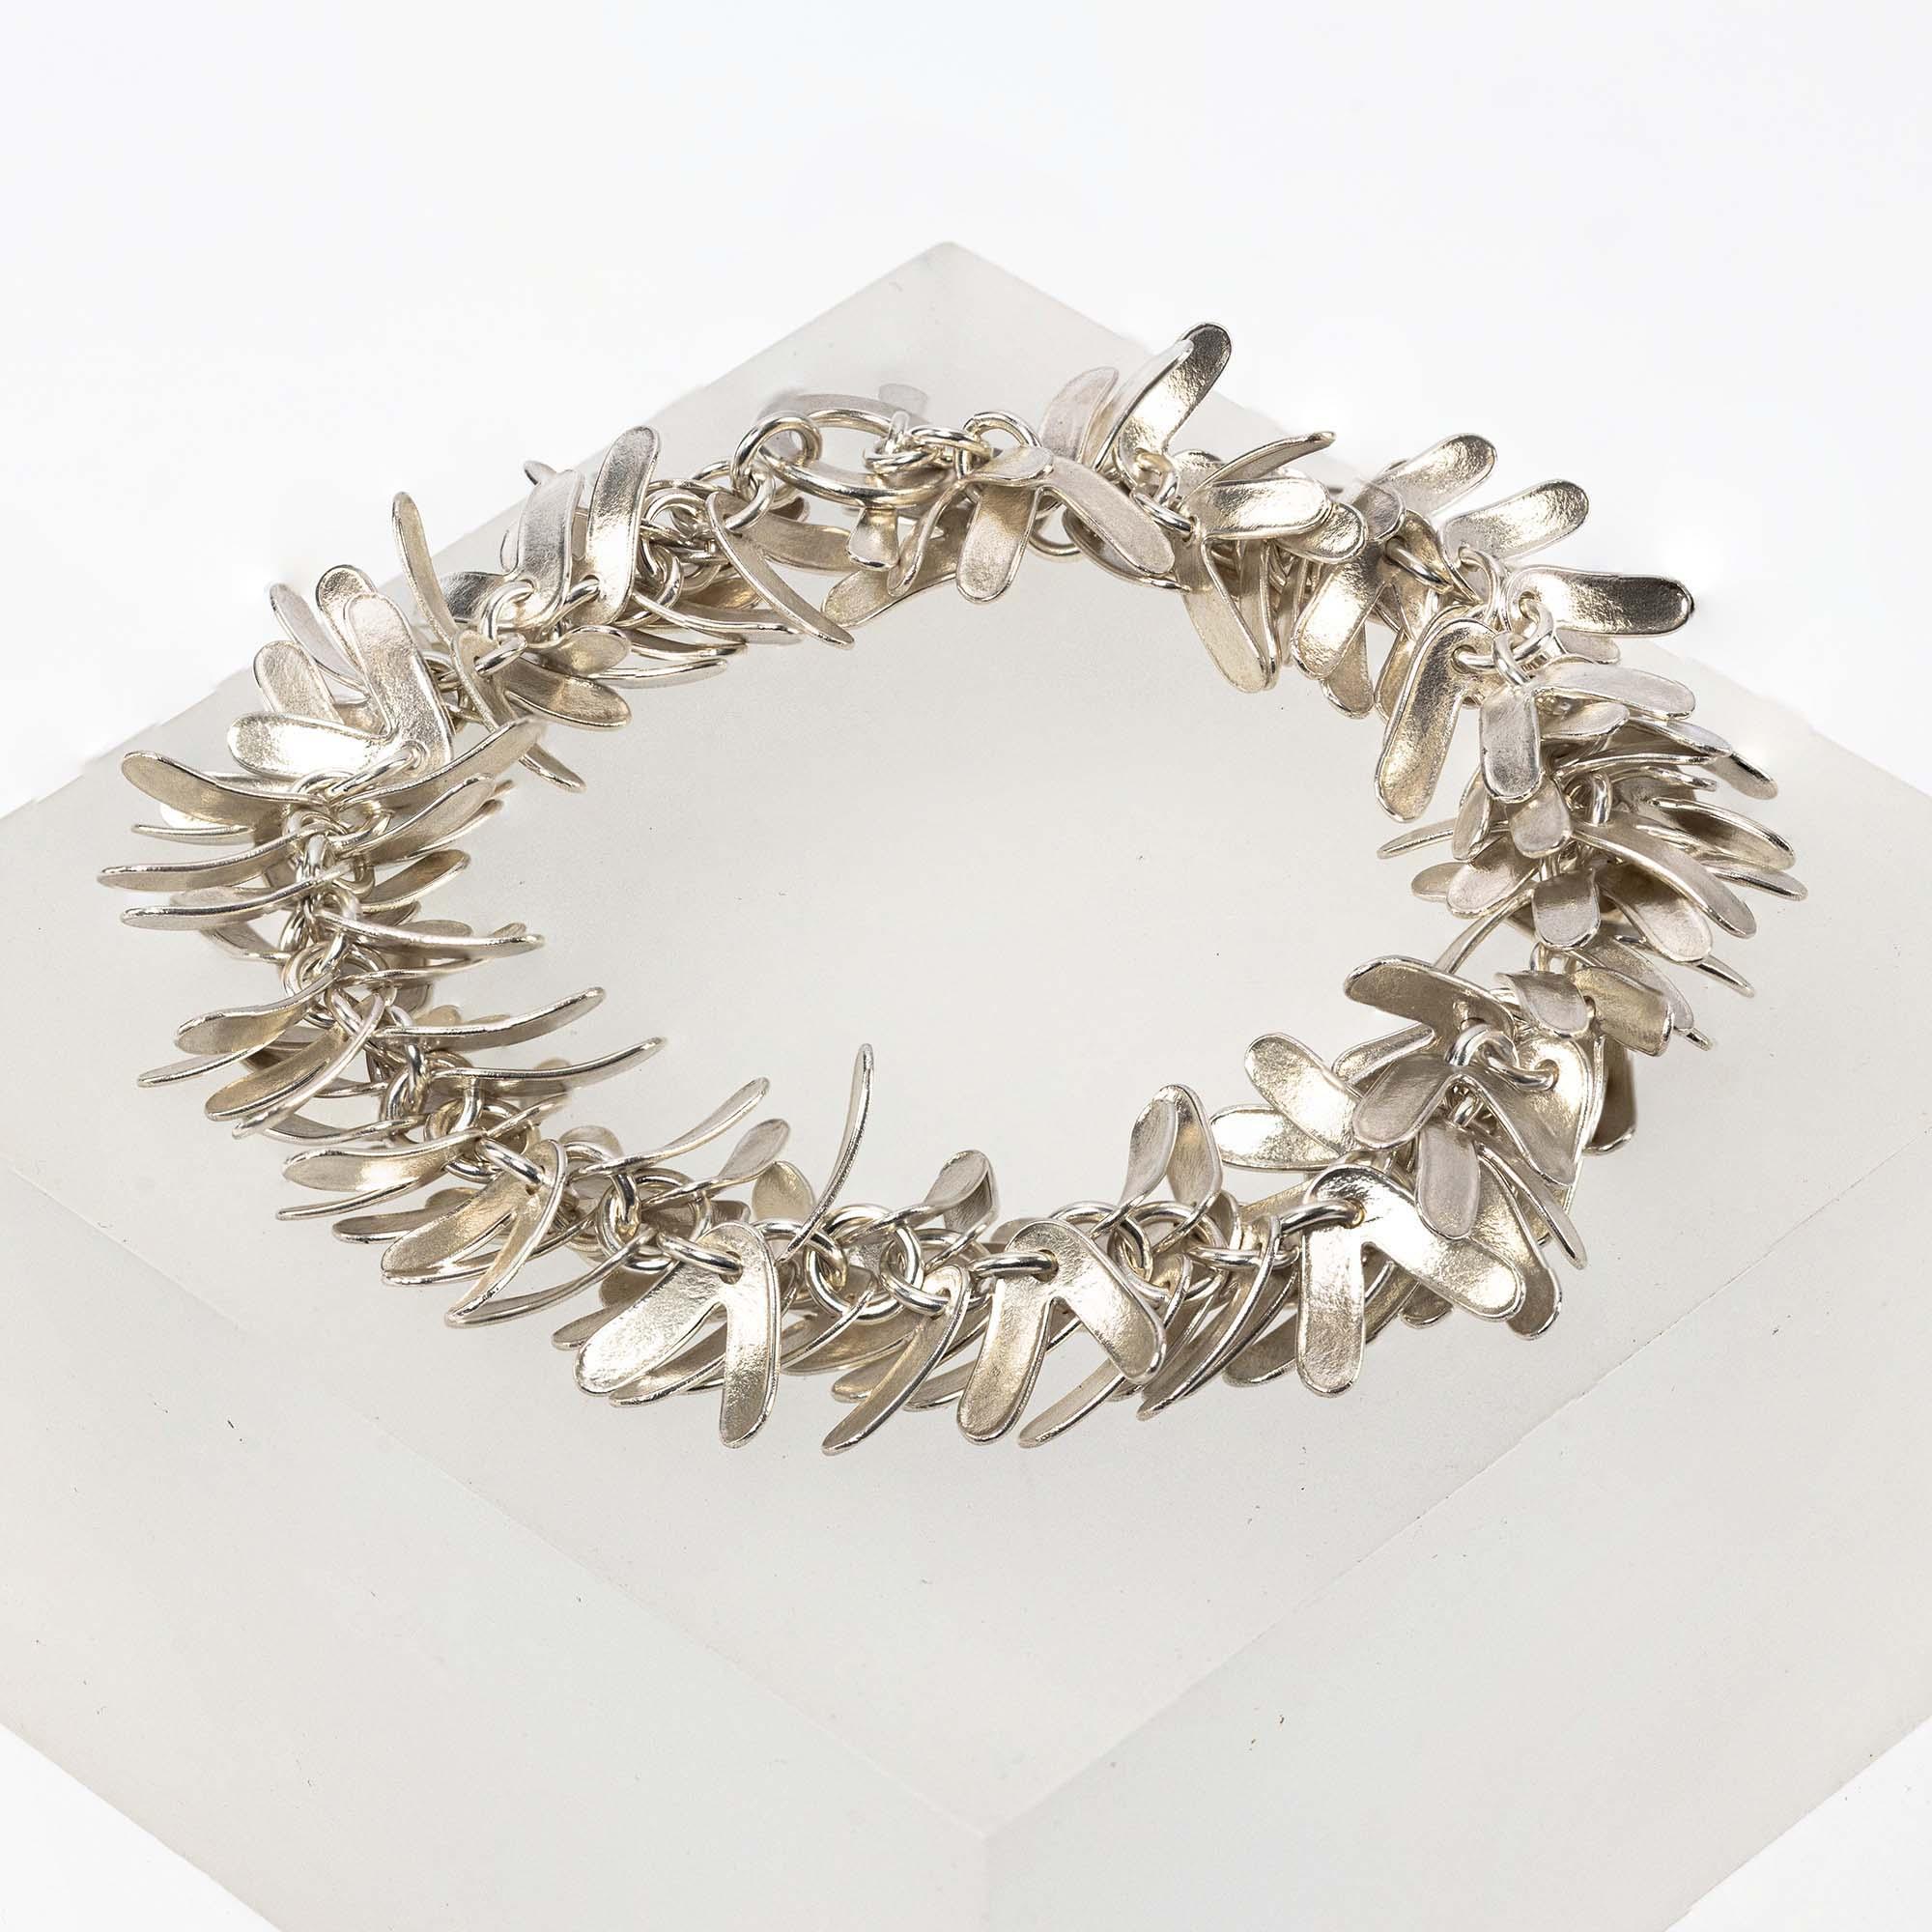 Glenn Campbell CAT-02 Catkin Bracelet 7.5 Inches £665